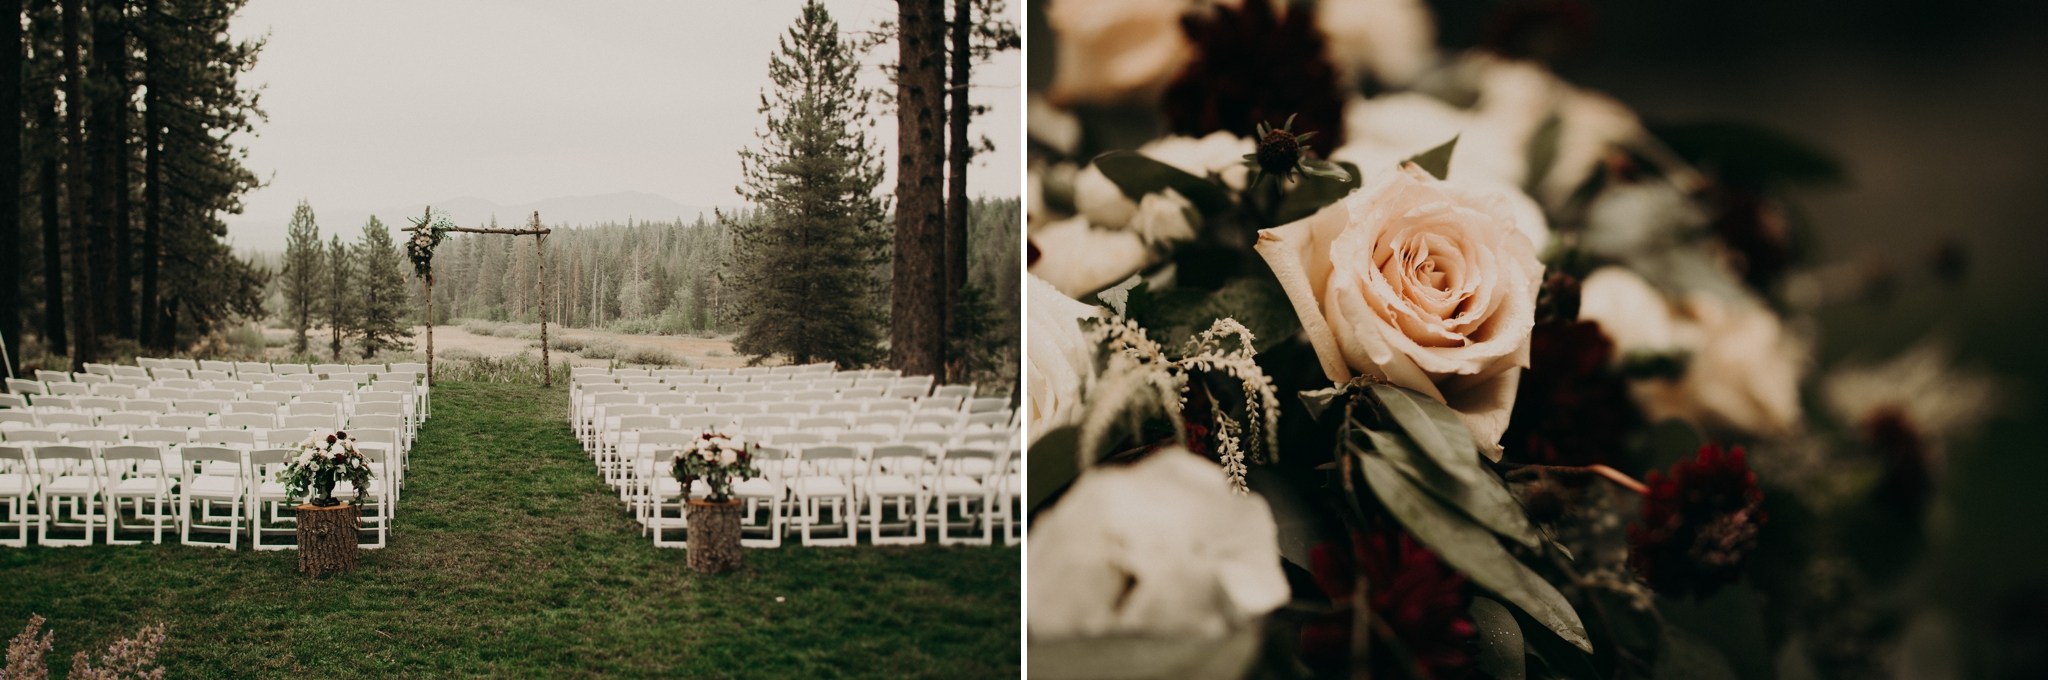 redwood-wedding12.jpg